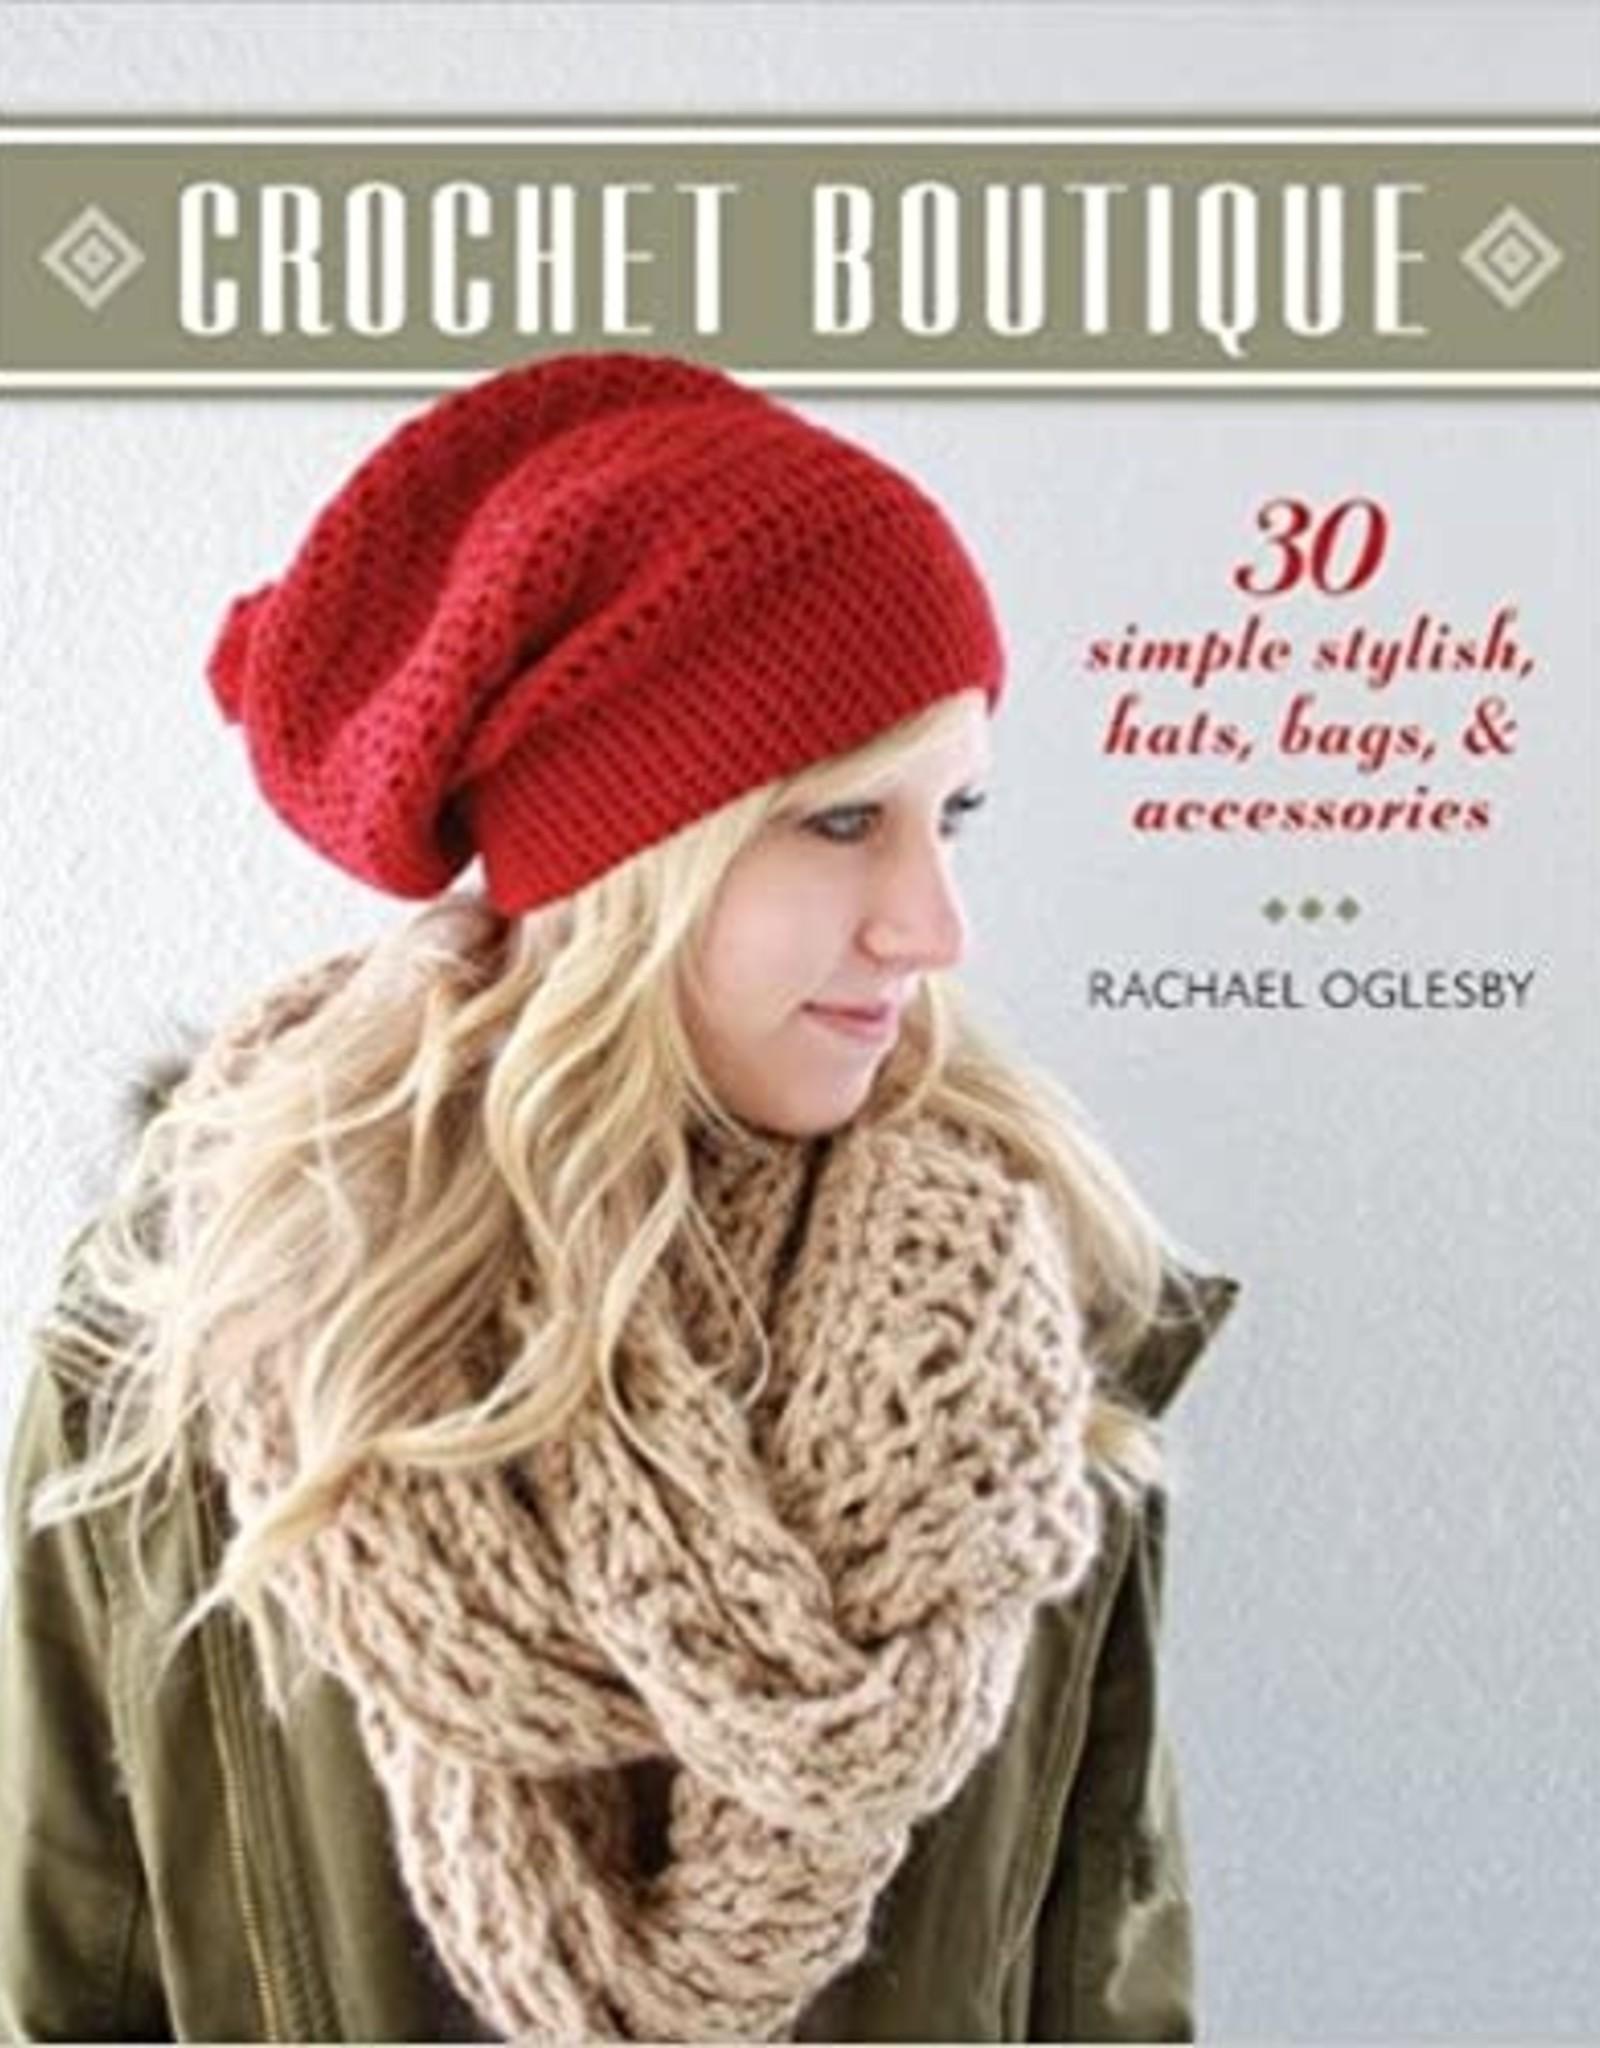 Ingram Crochet Boutique: 30 Simple Stylish Hats, Bags Accessories